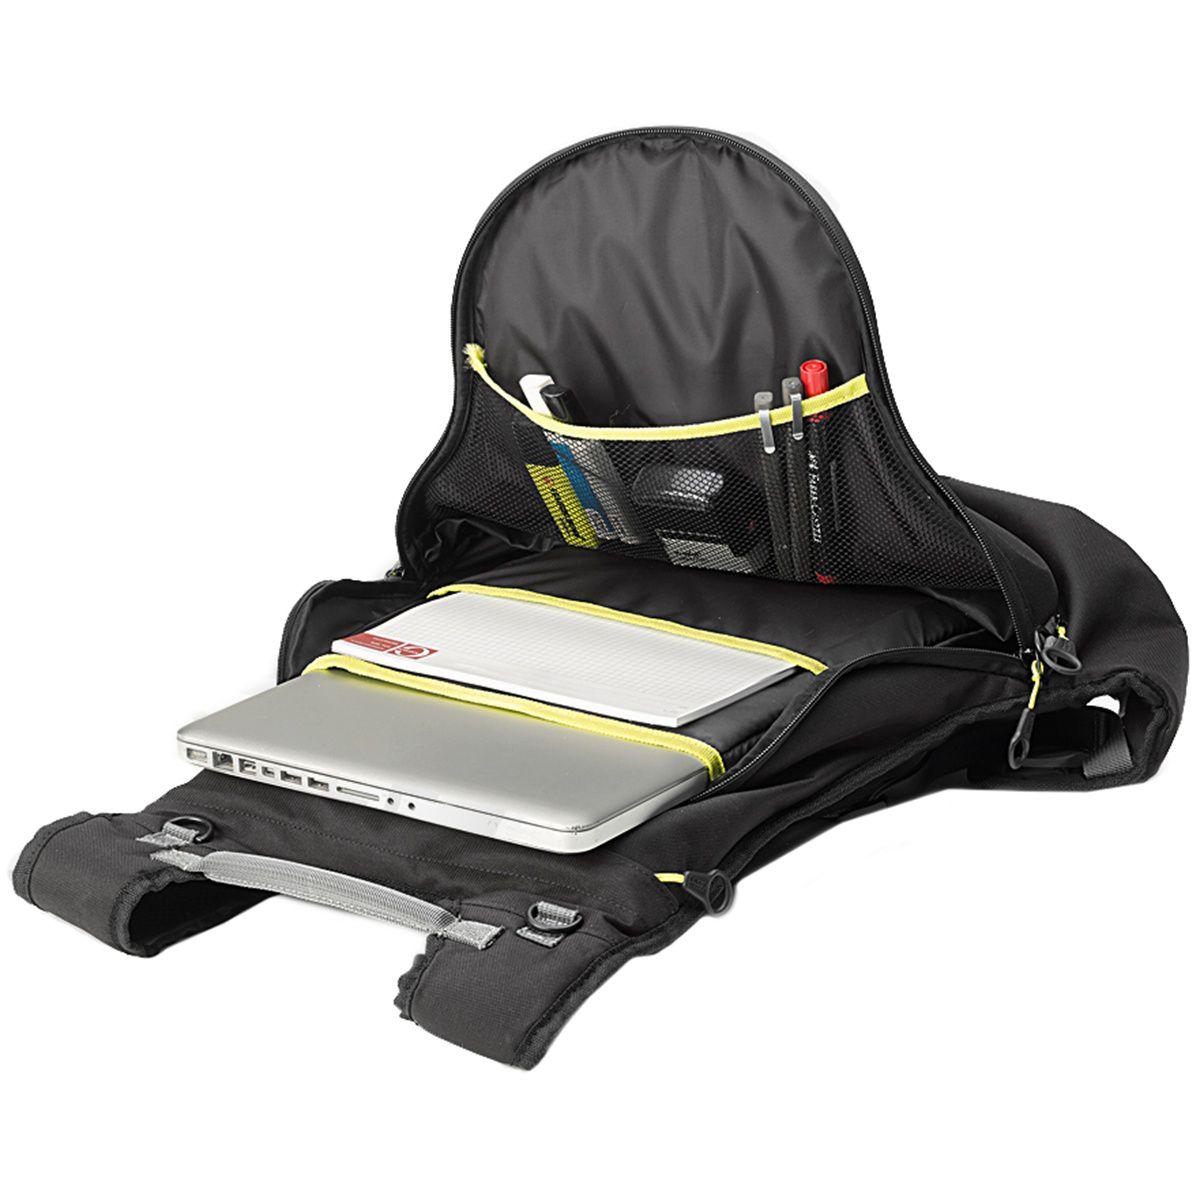 Bolsa/Mochila Givi Porta Capacete EA104B - Pronta Entrega  - Nova Suzuki Motos e Acessórios